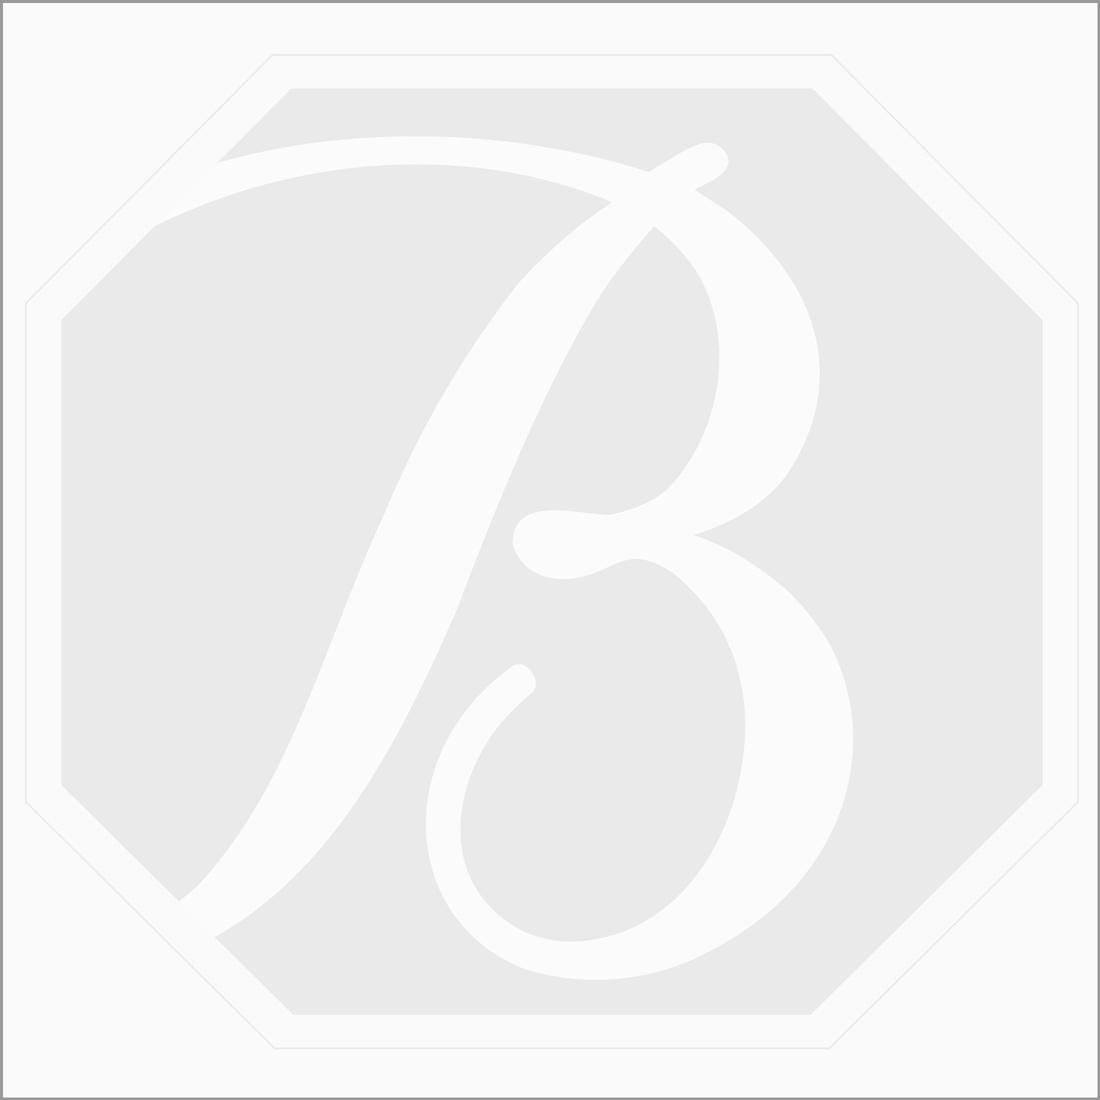 Black Diamond Cubes - 3 Lines - 77.13 carats (BDiaCu1002)